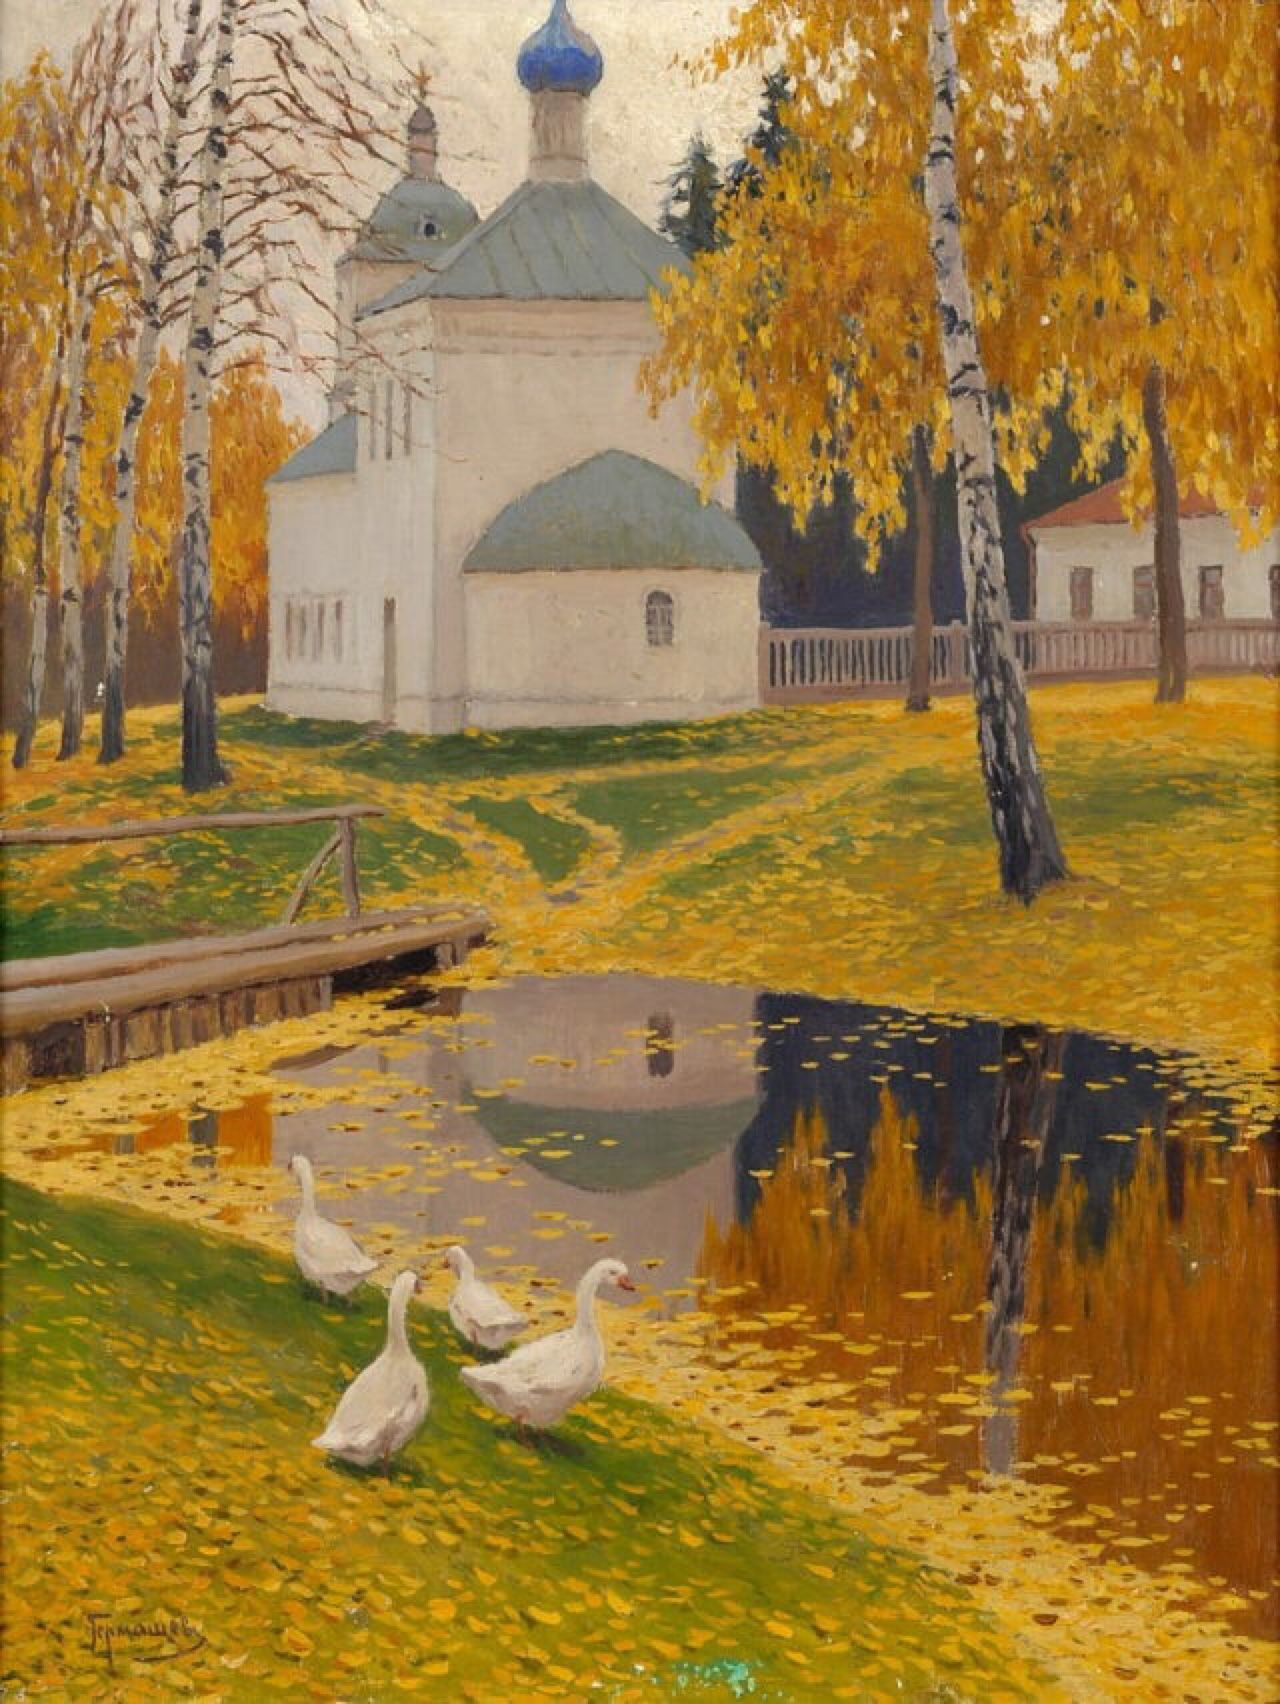 Autumn Landscape with Church, Mihail Germashev